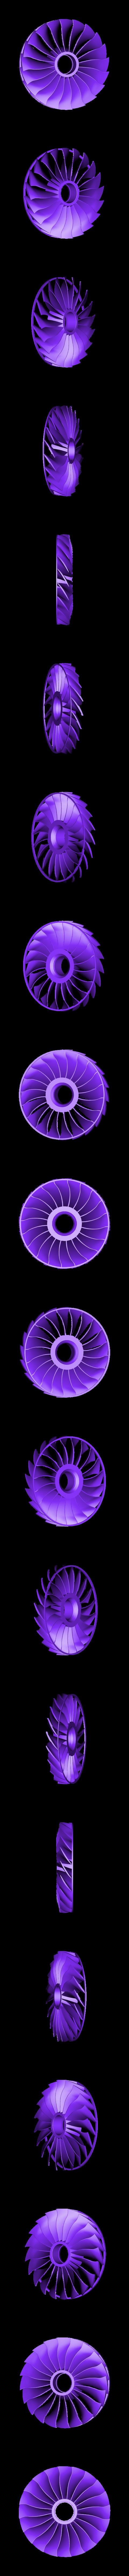 Fan-Blade-CW01ws.stl Download STL file Thrust Reverser with Turbofan Engine Nacelle • 3D printable model, konchan77